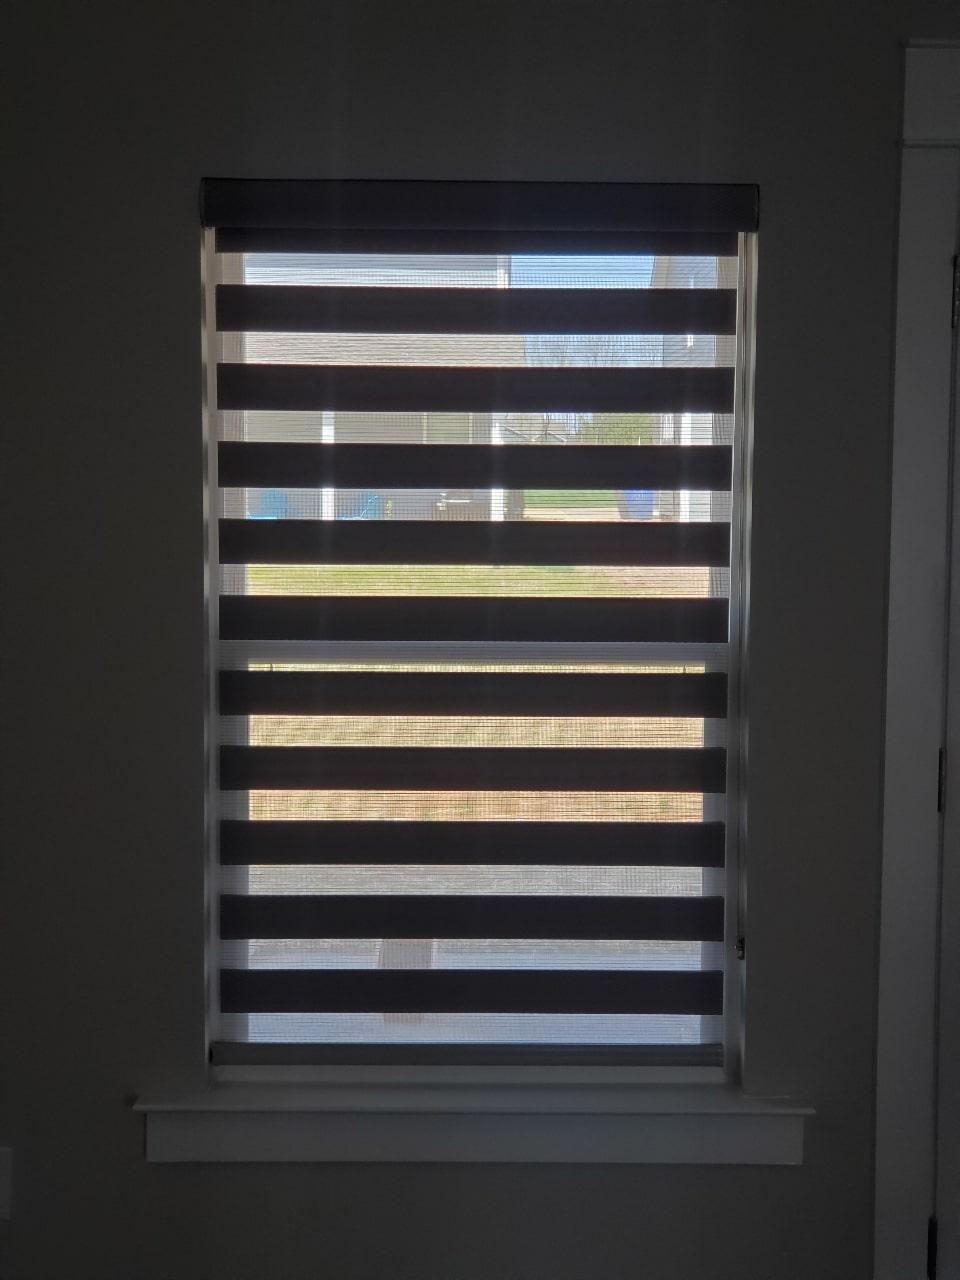 Layered Shade - Interior Window Plantation Shutters - Custom, Motorized Window Treatments, Blind Repair, Custom Blinds | Nashville, TN